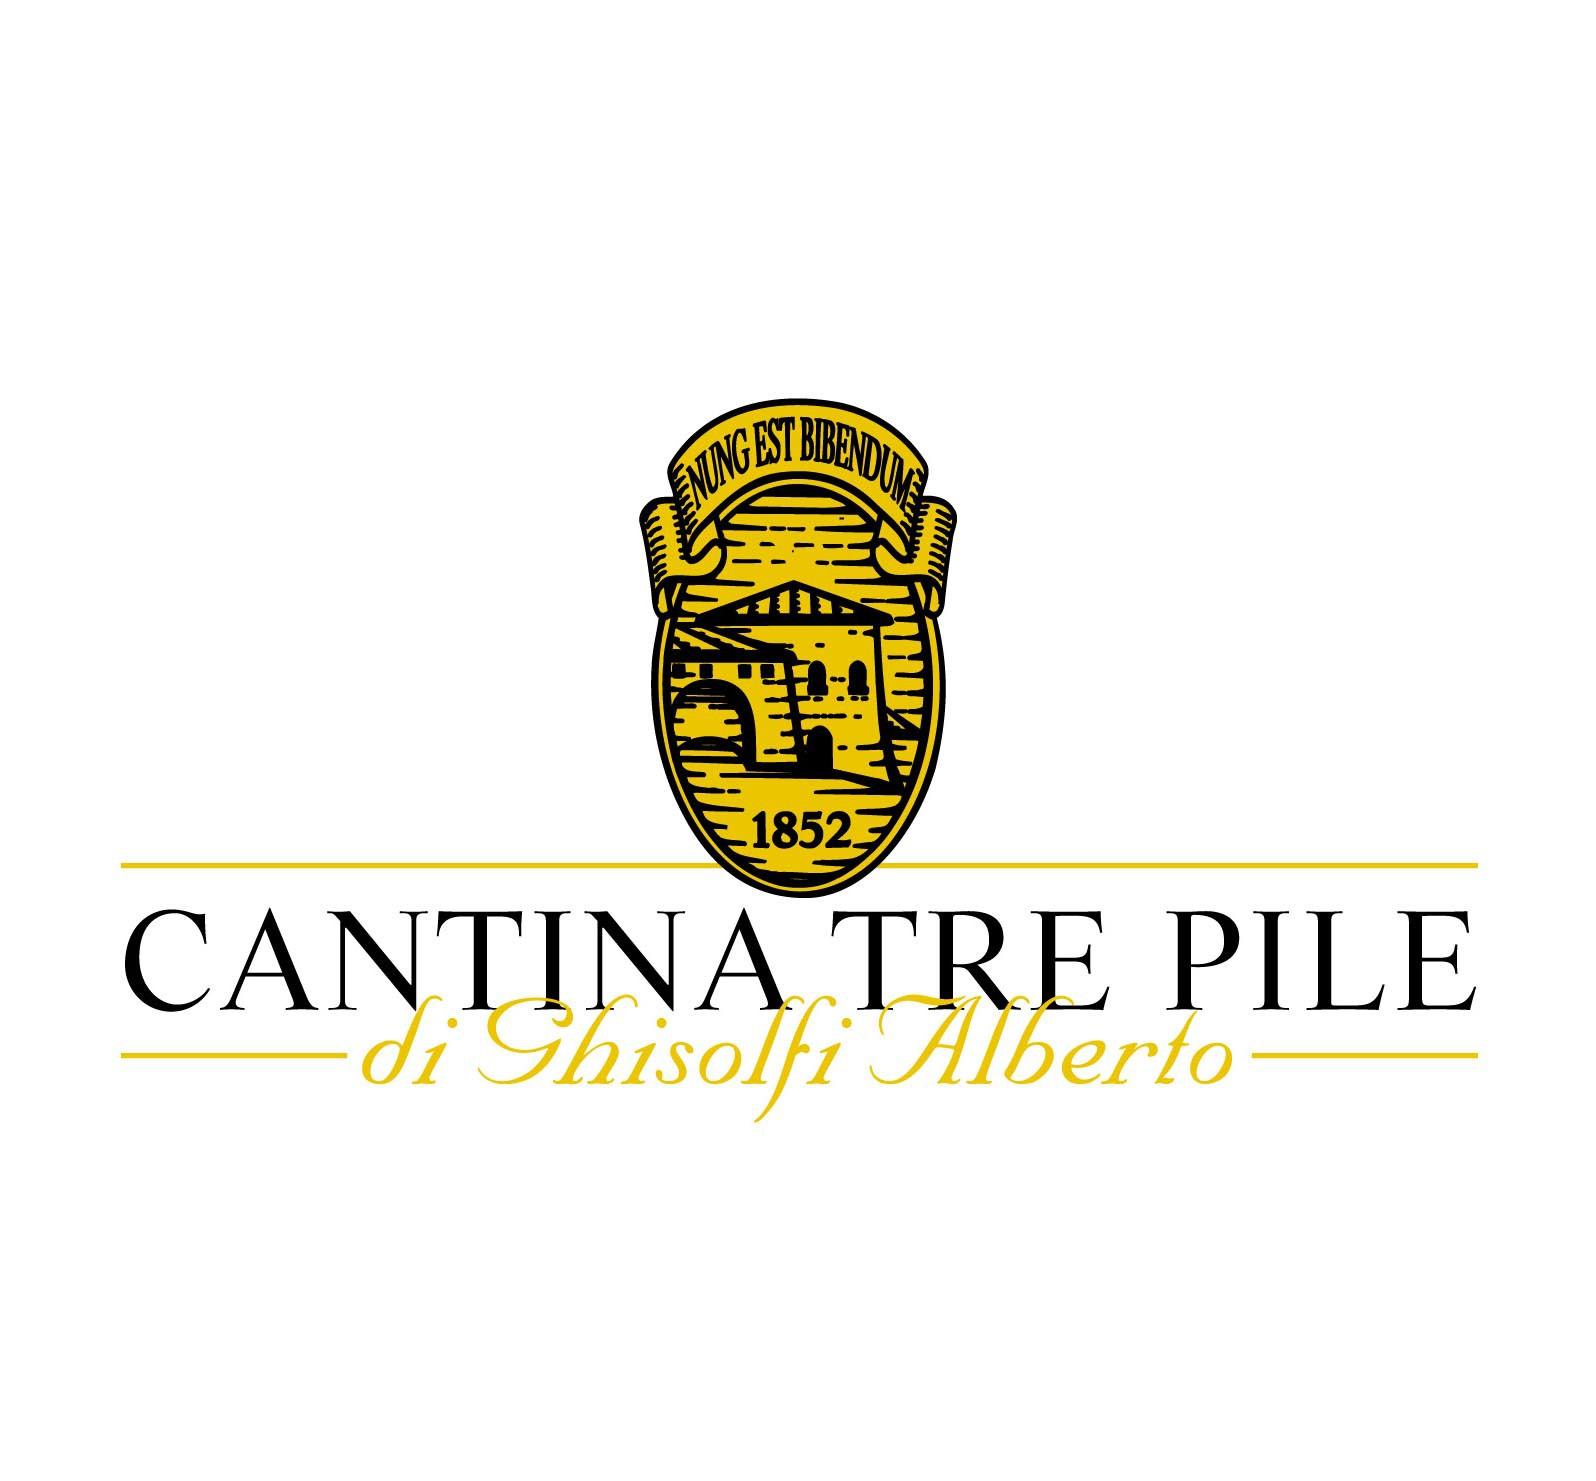 TrePile logo vecchio - Re-Branding & Design etichette Tre Pile